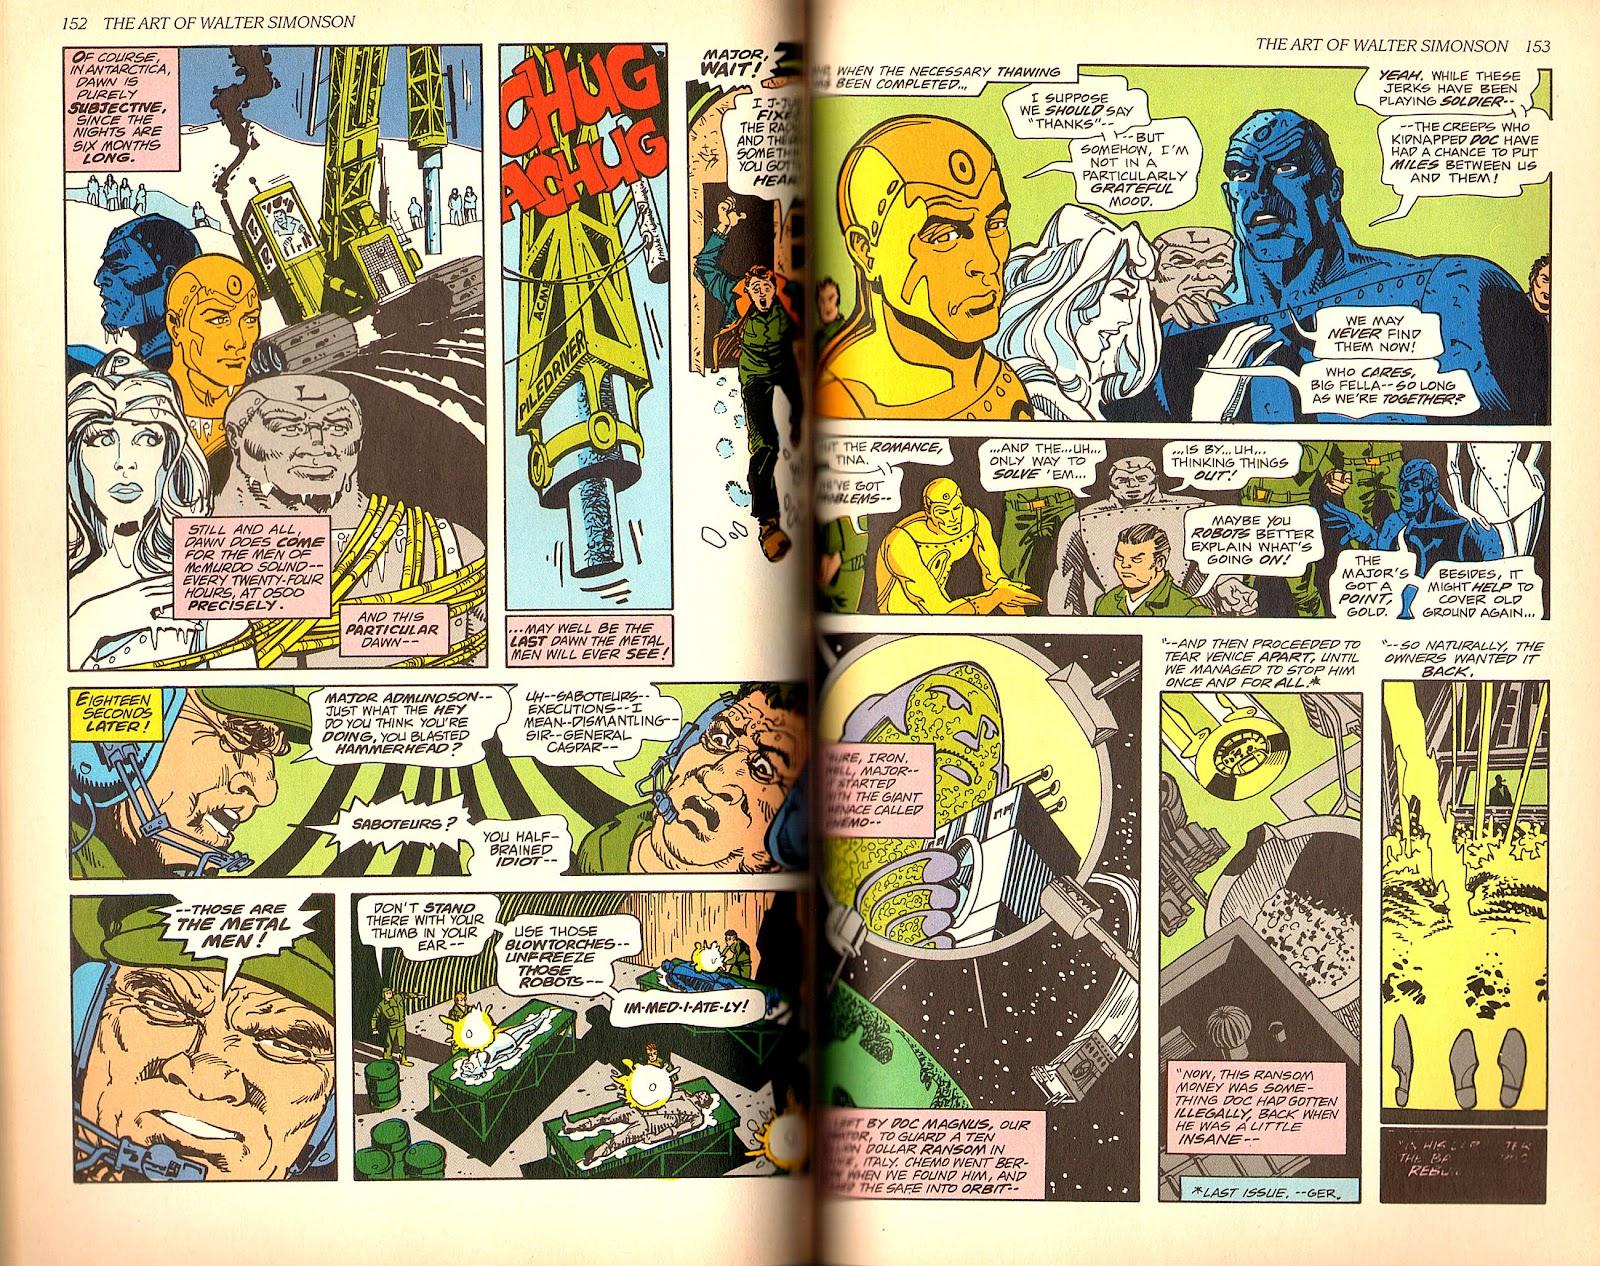 Read online The Art of Walter Simonson comic -  Issue # TPB - 78